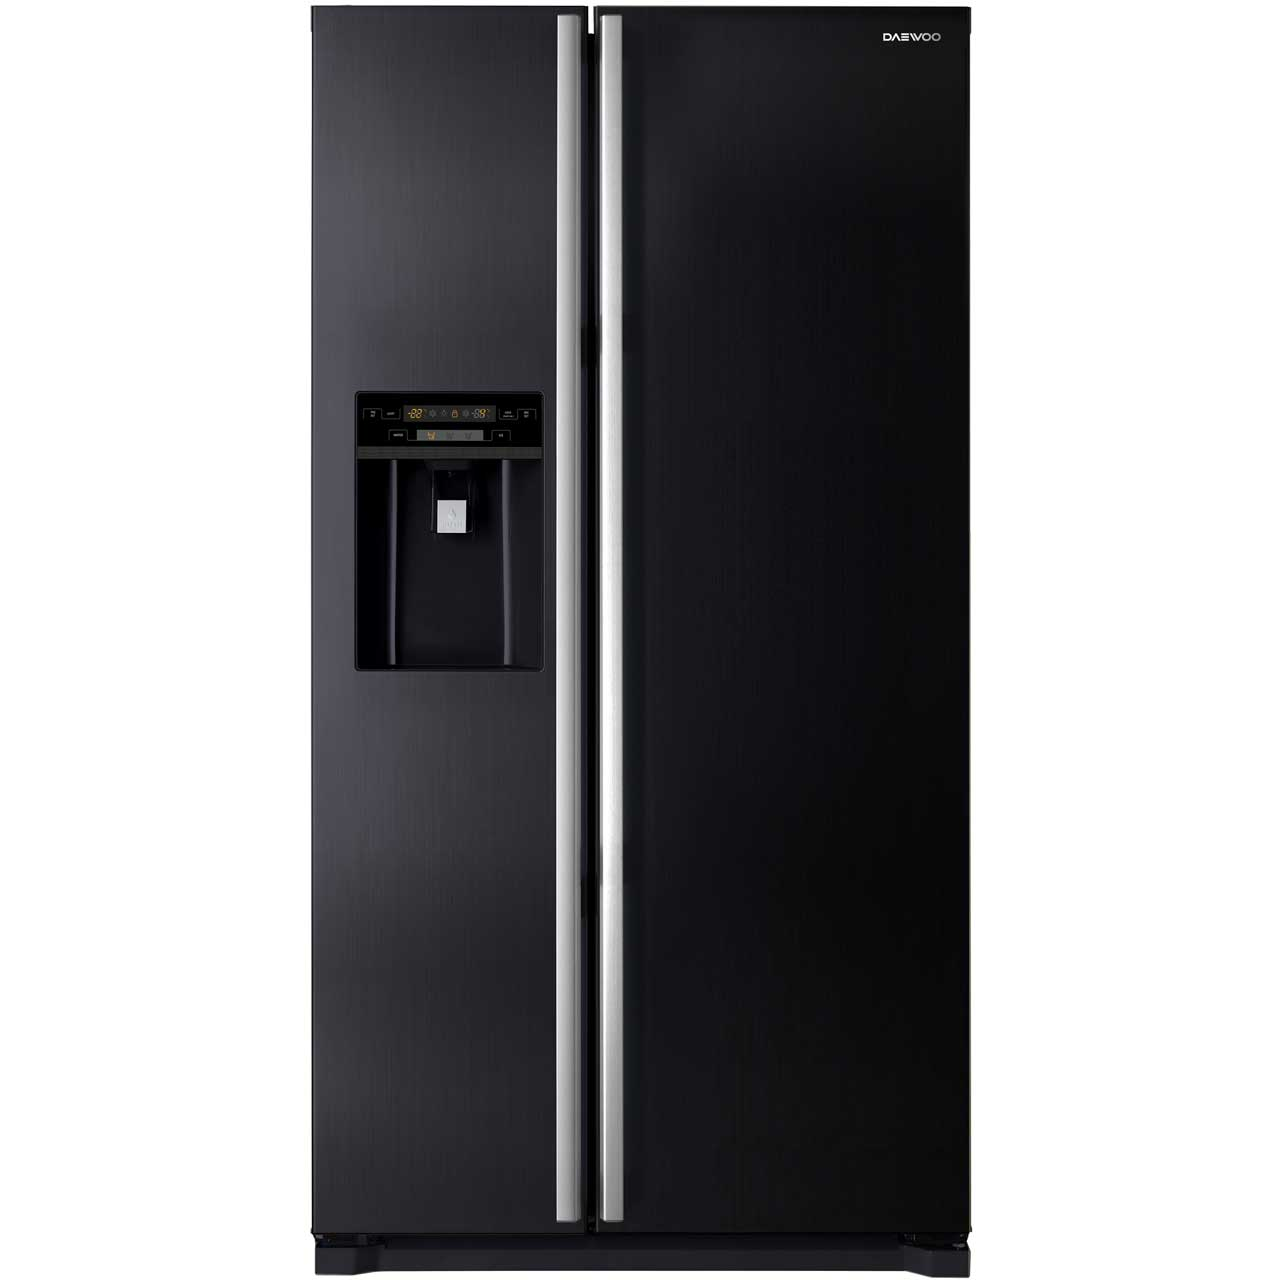 Daewoo FRAX22NP3B Free Standing American Fridge Freezer in Black